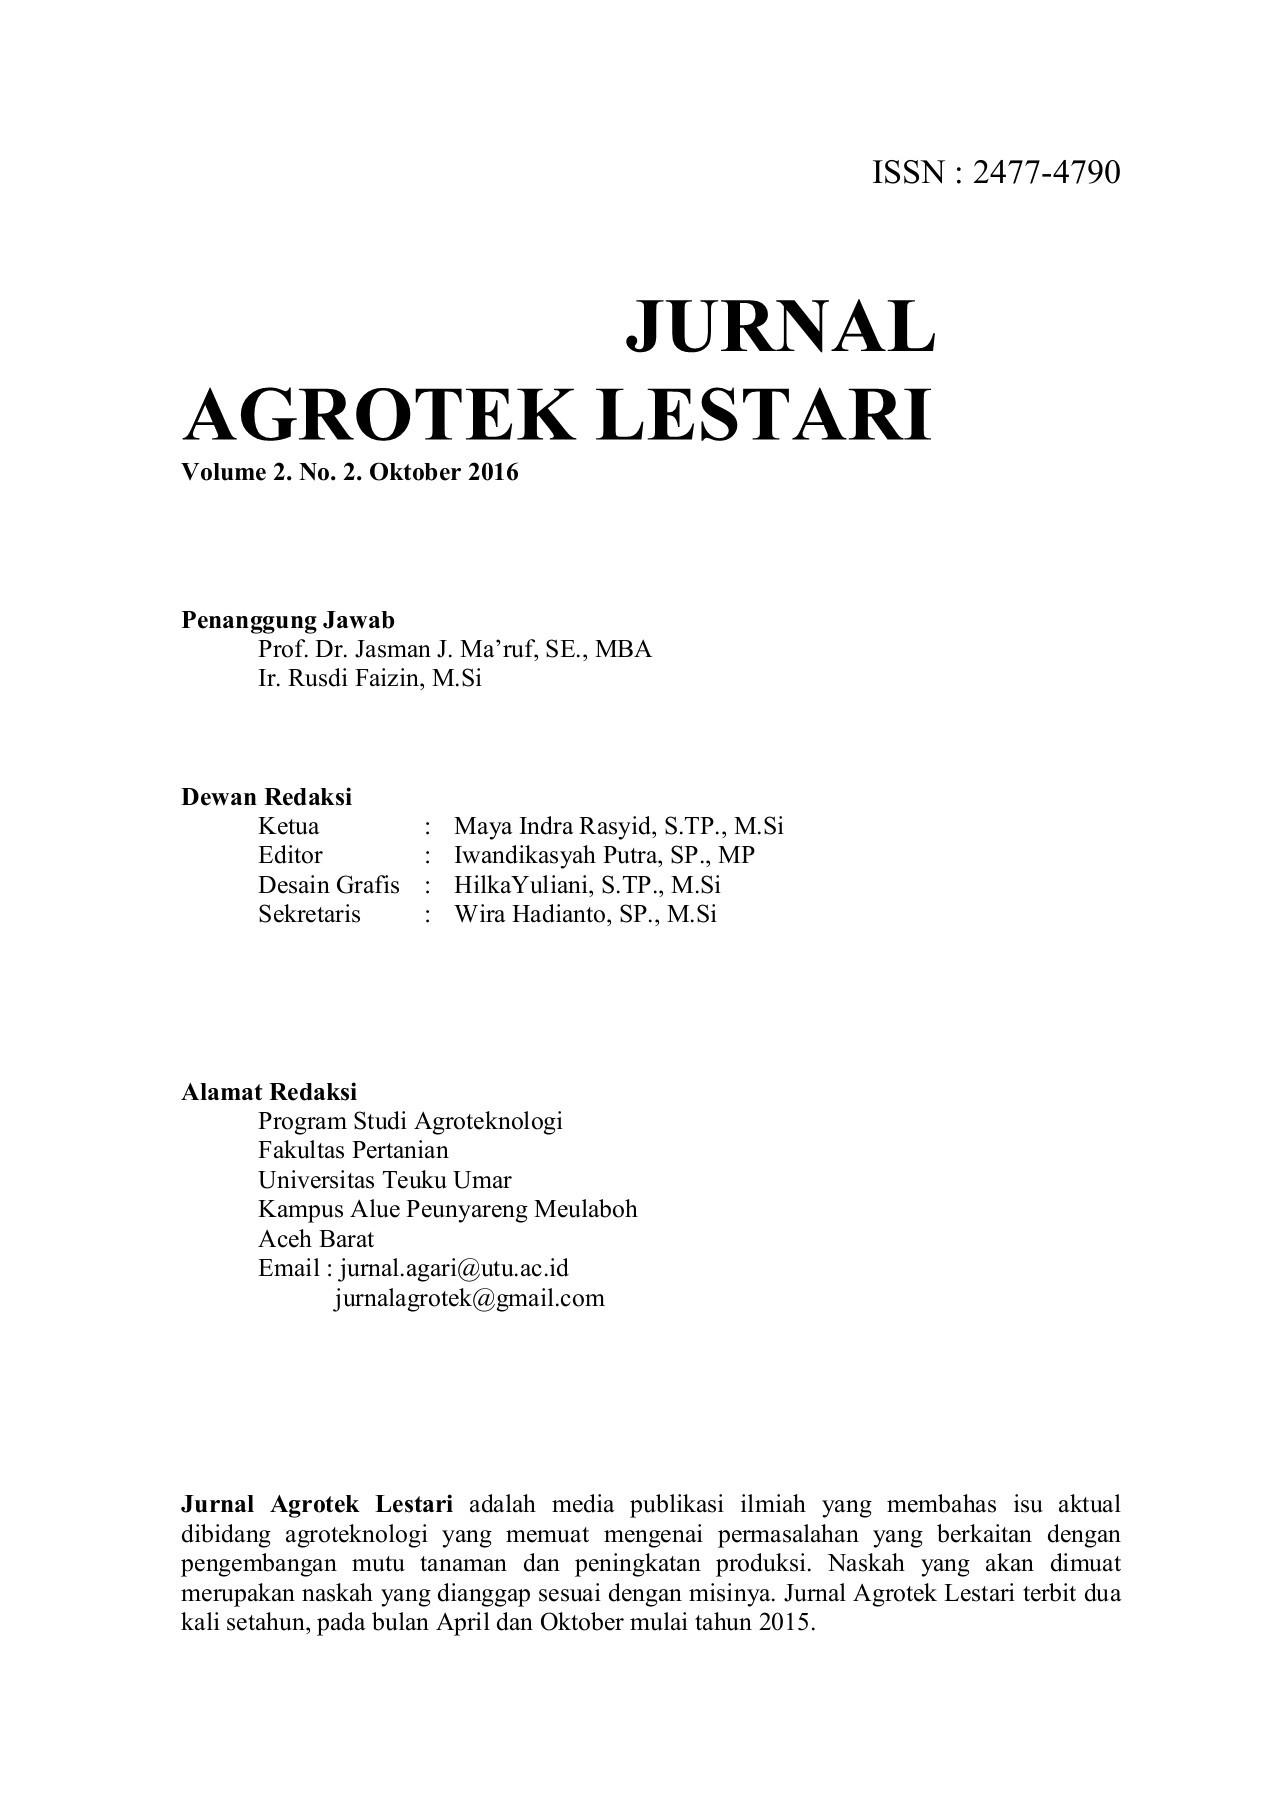 agrotek lestari vol 2, no 2, oktober 2016 pubhtml5  2 about agrotek #7